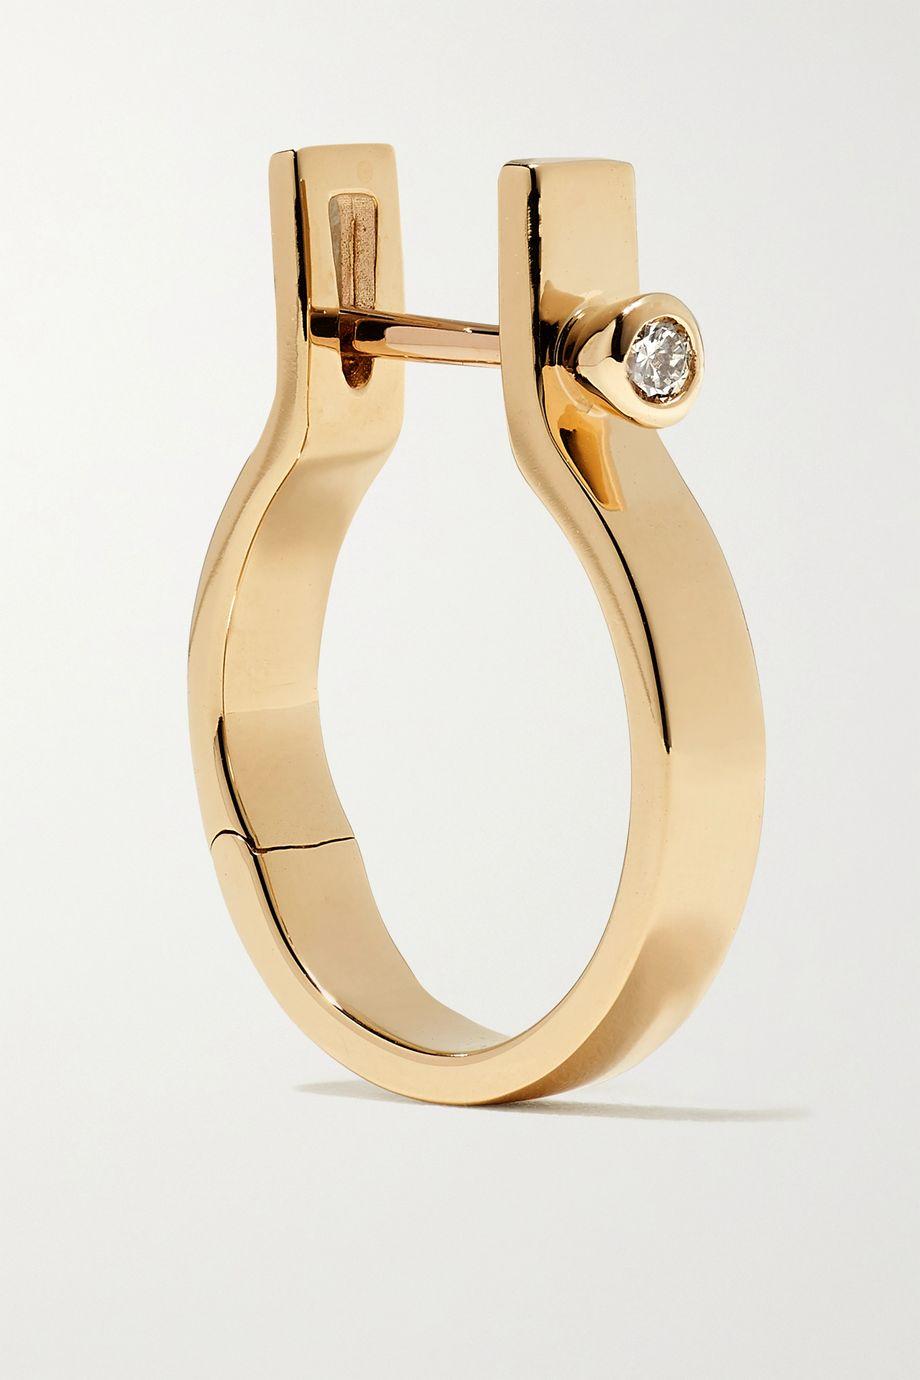 Hirotaka Indústria 10-karat gold diamond hoop earring